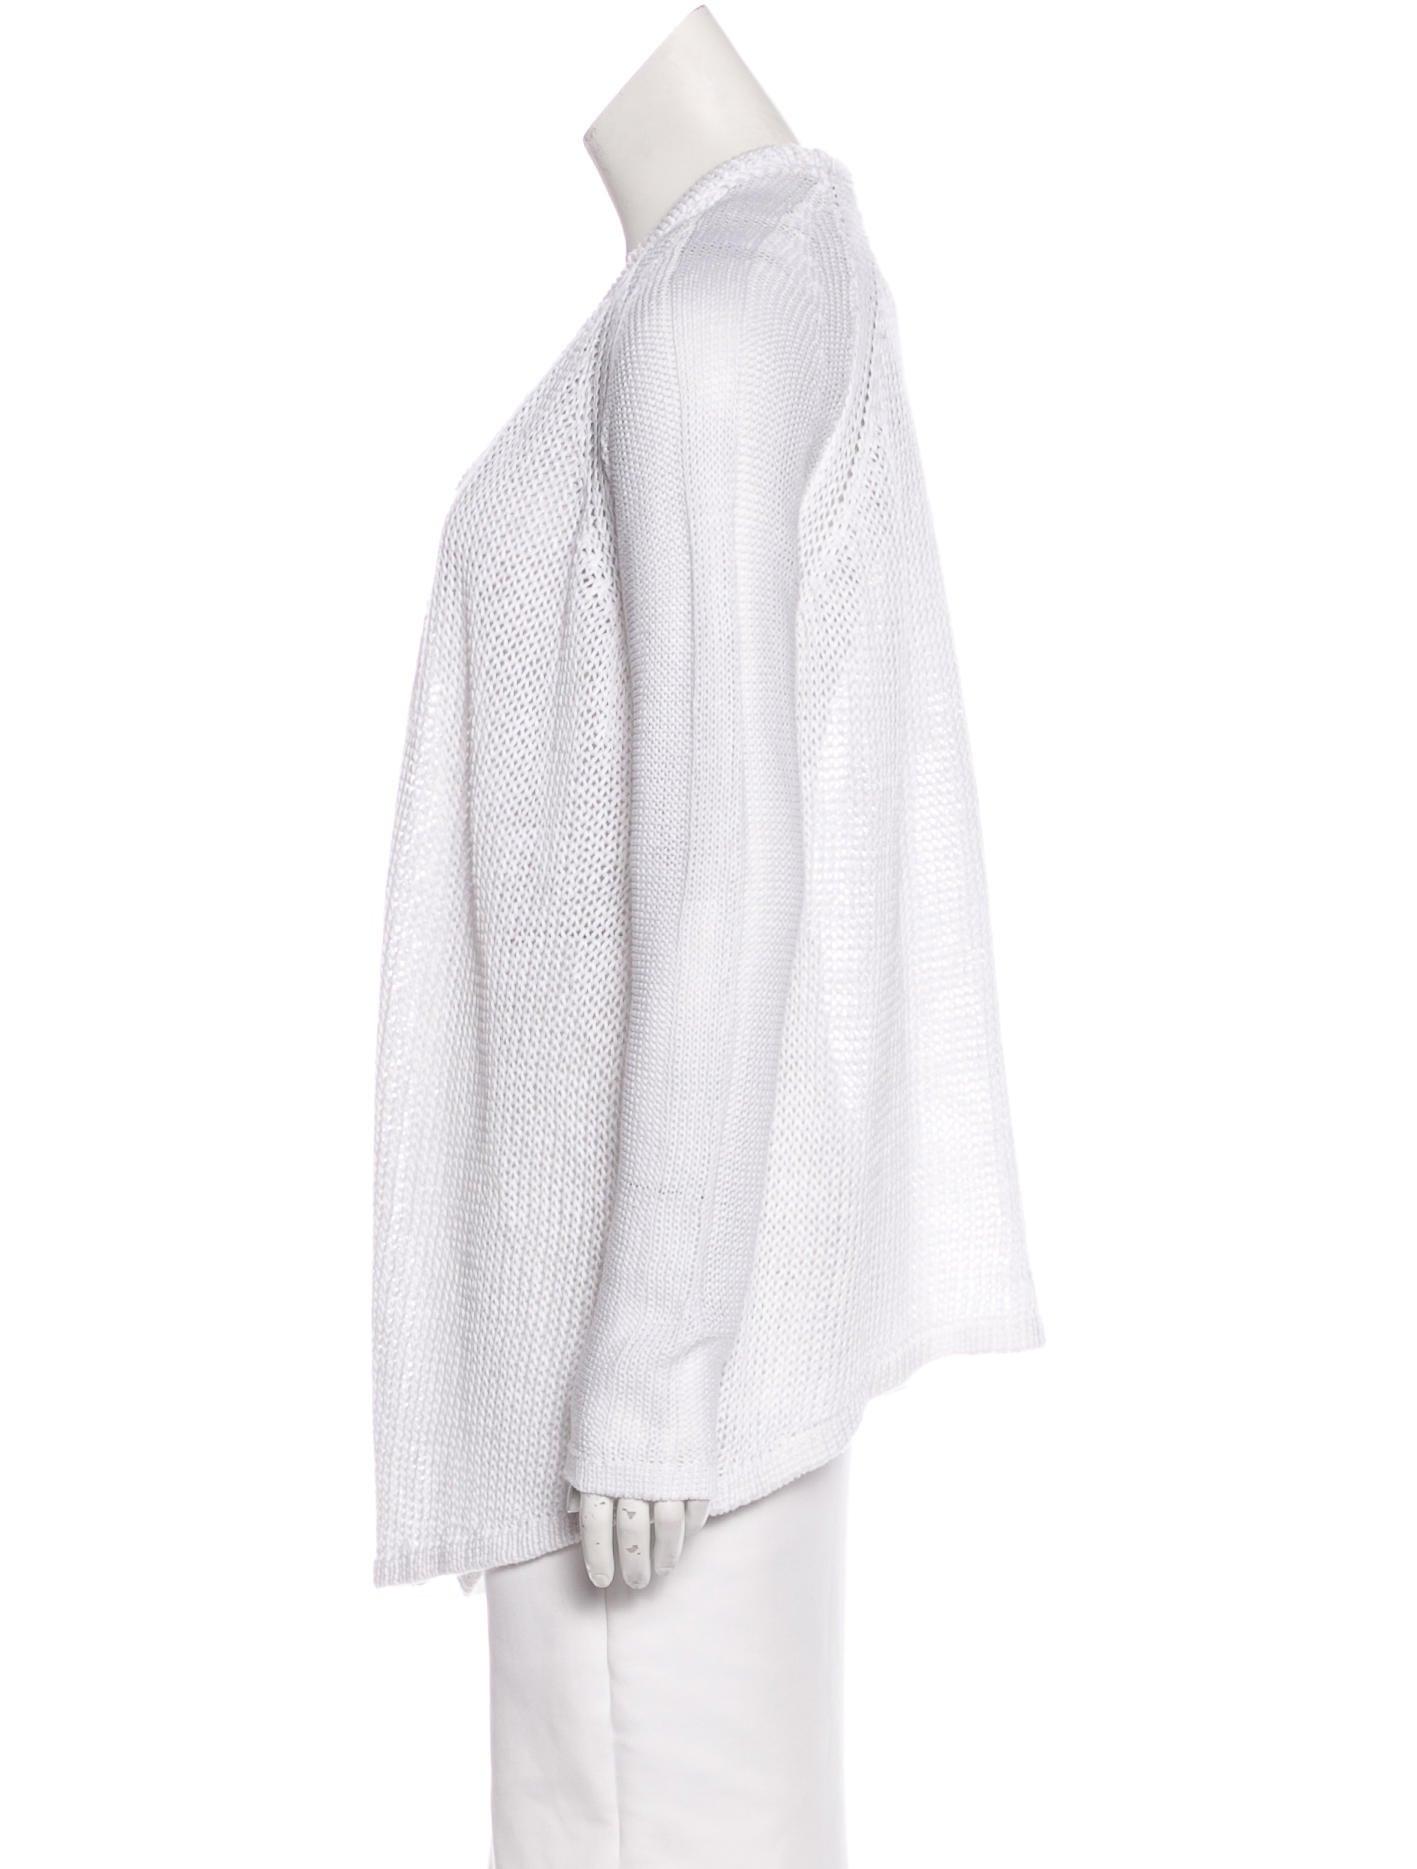 Knitting Pattern Open Front Cardigan : Helmut Lang Knit Open Front Cardigan - Clothing - WHELM49494 The RealReal